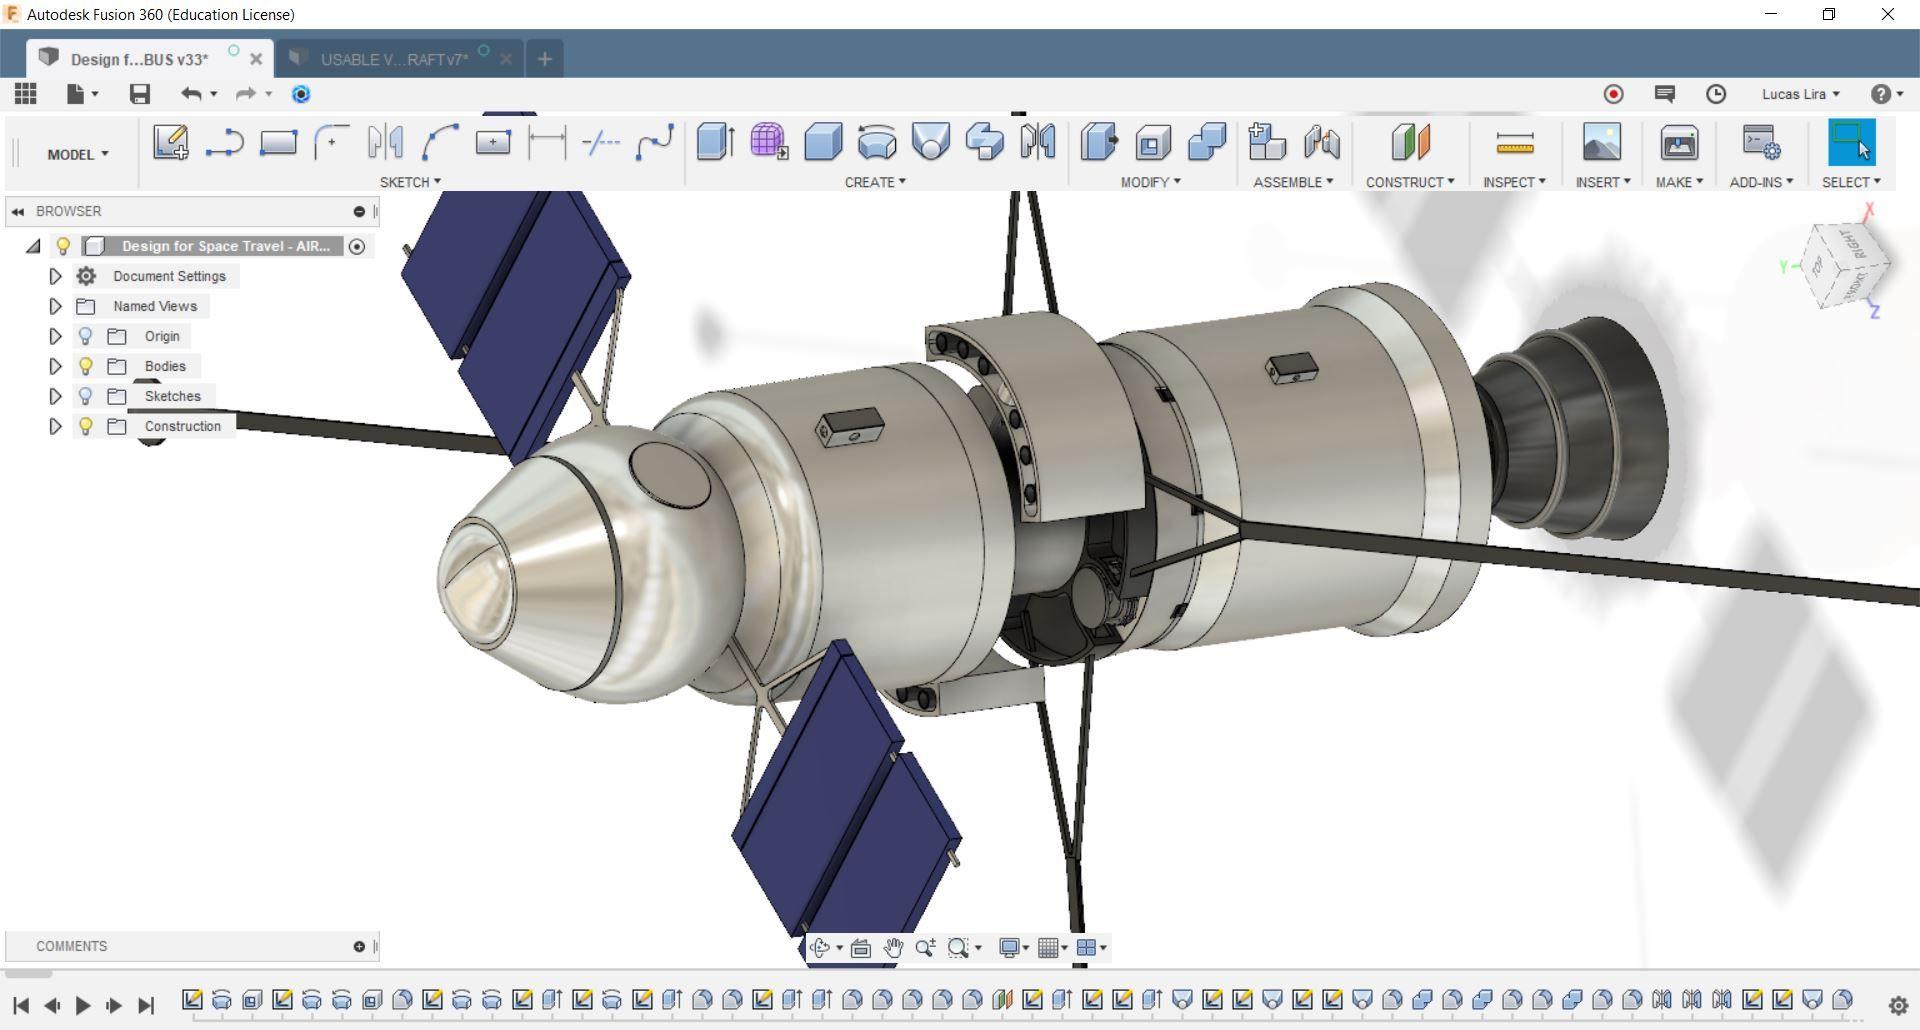 Design-for-space-travel-lunar-fab-3500-3500